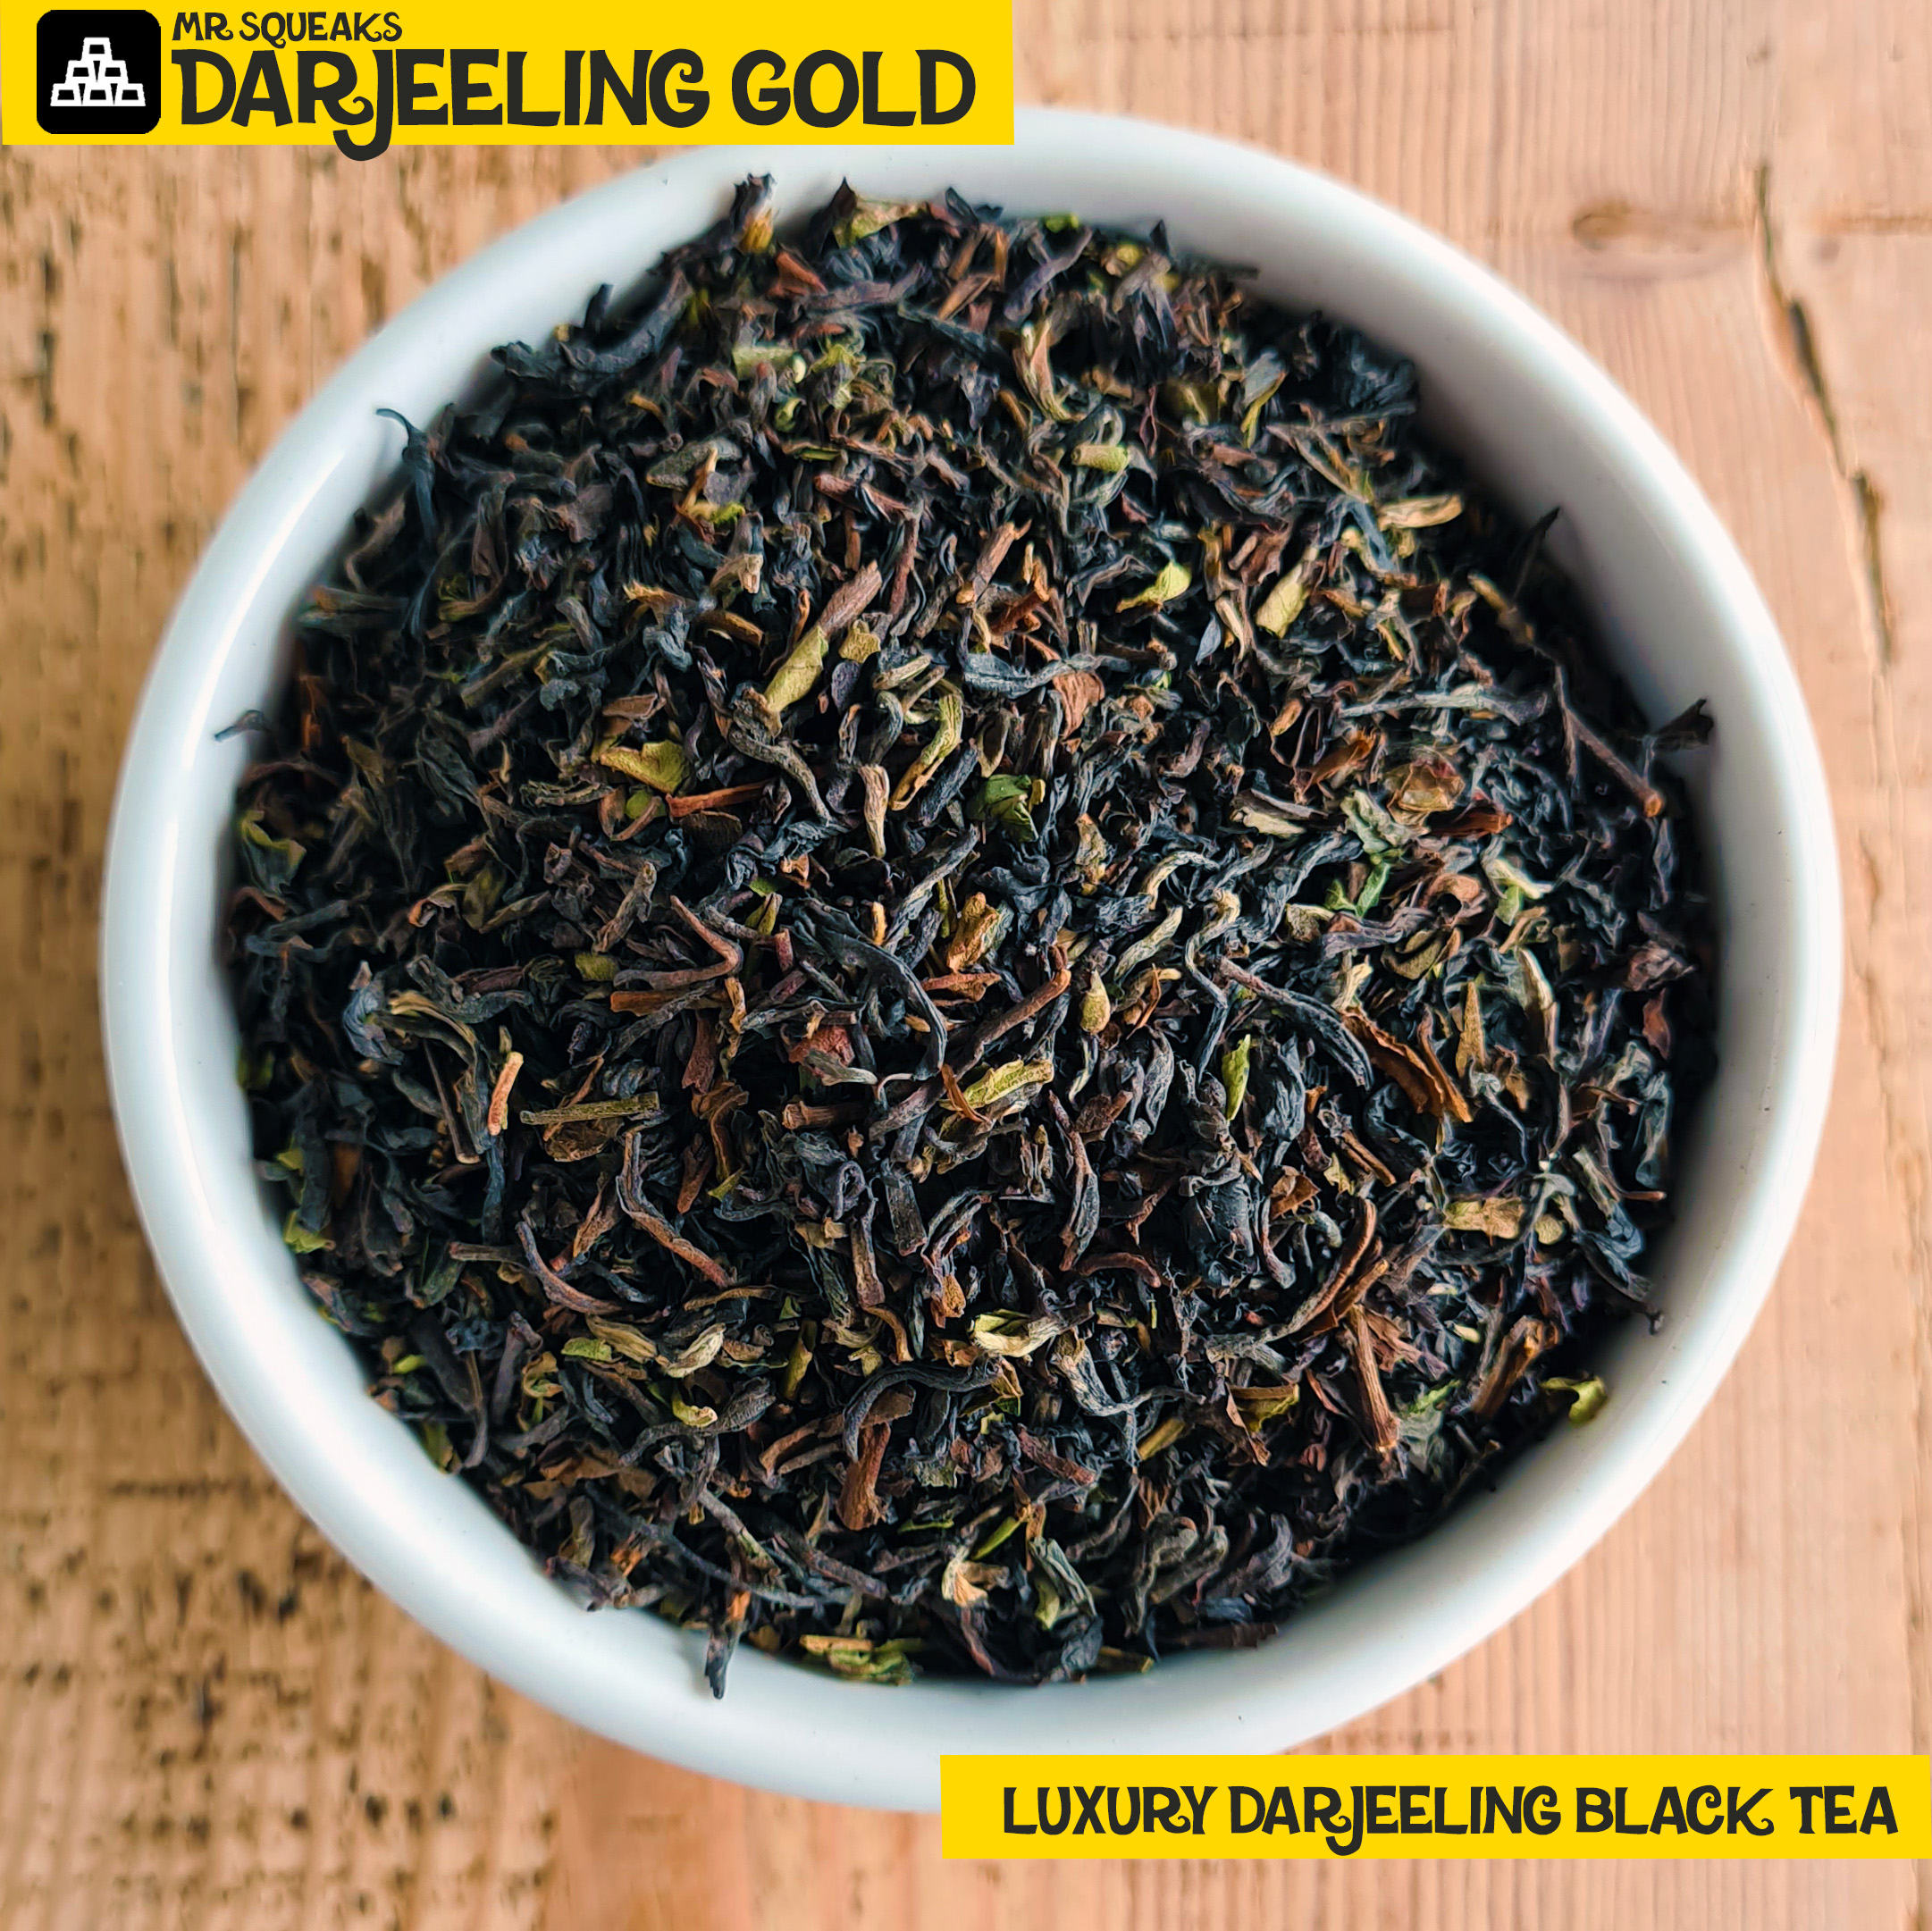 Darjeeling Gold